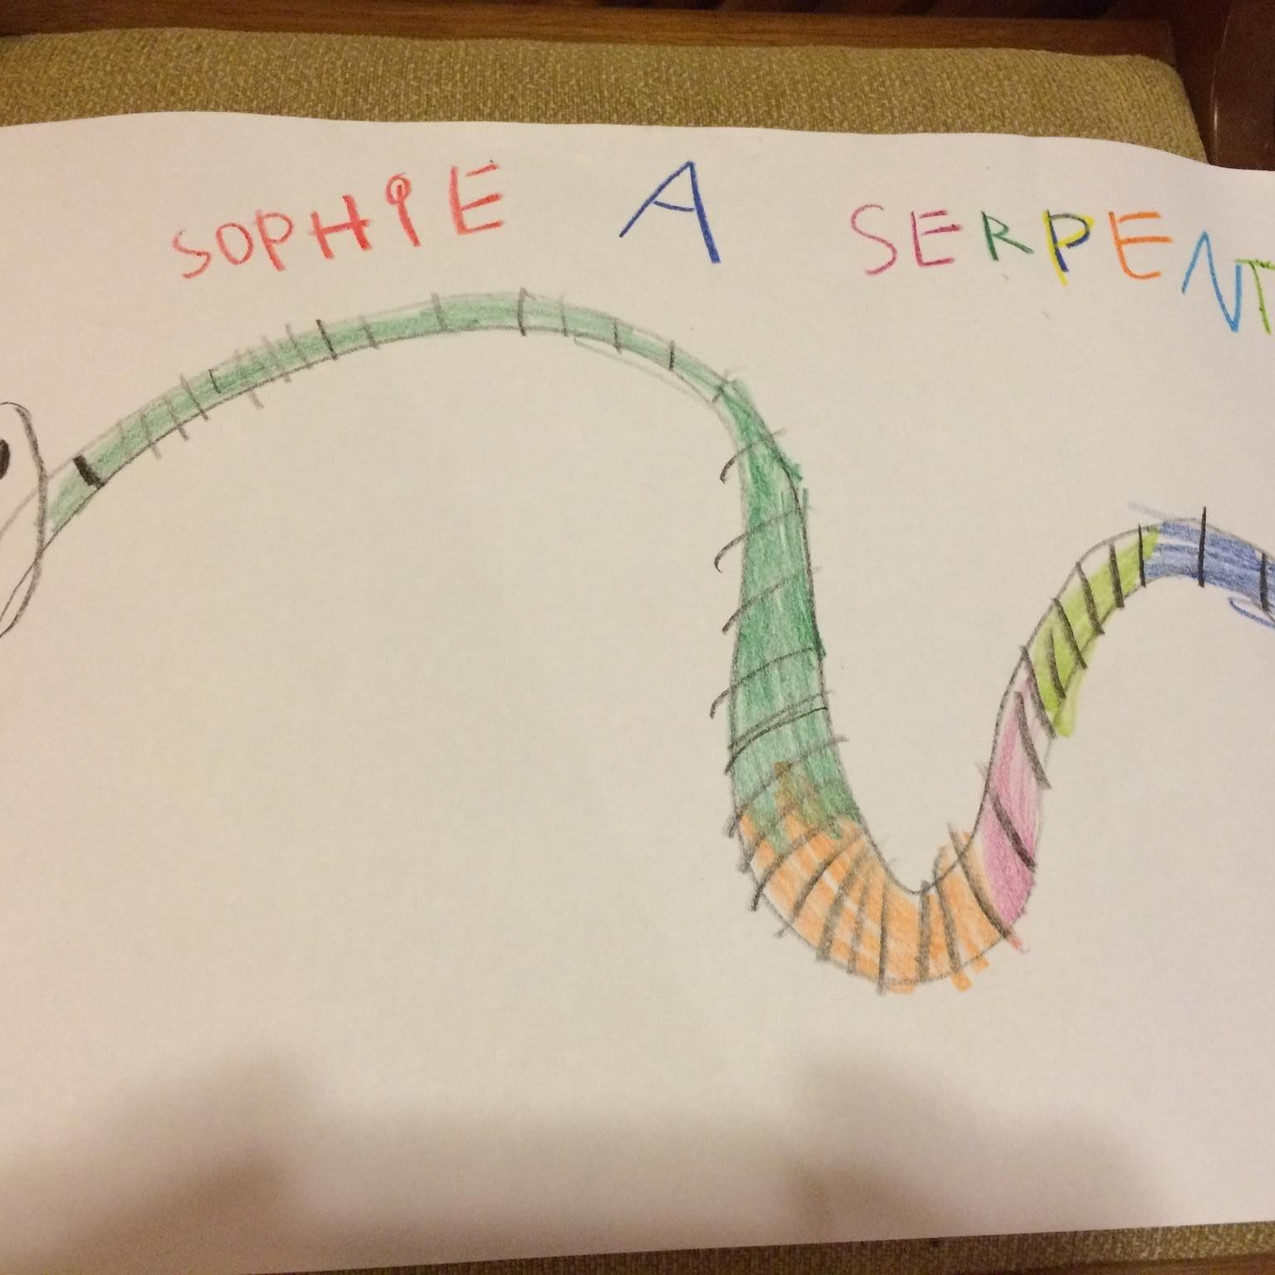 Serpente desenho